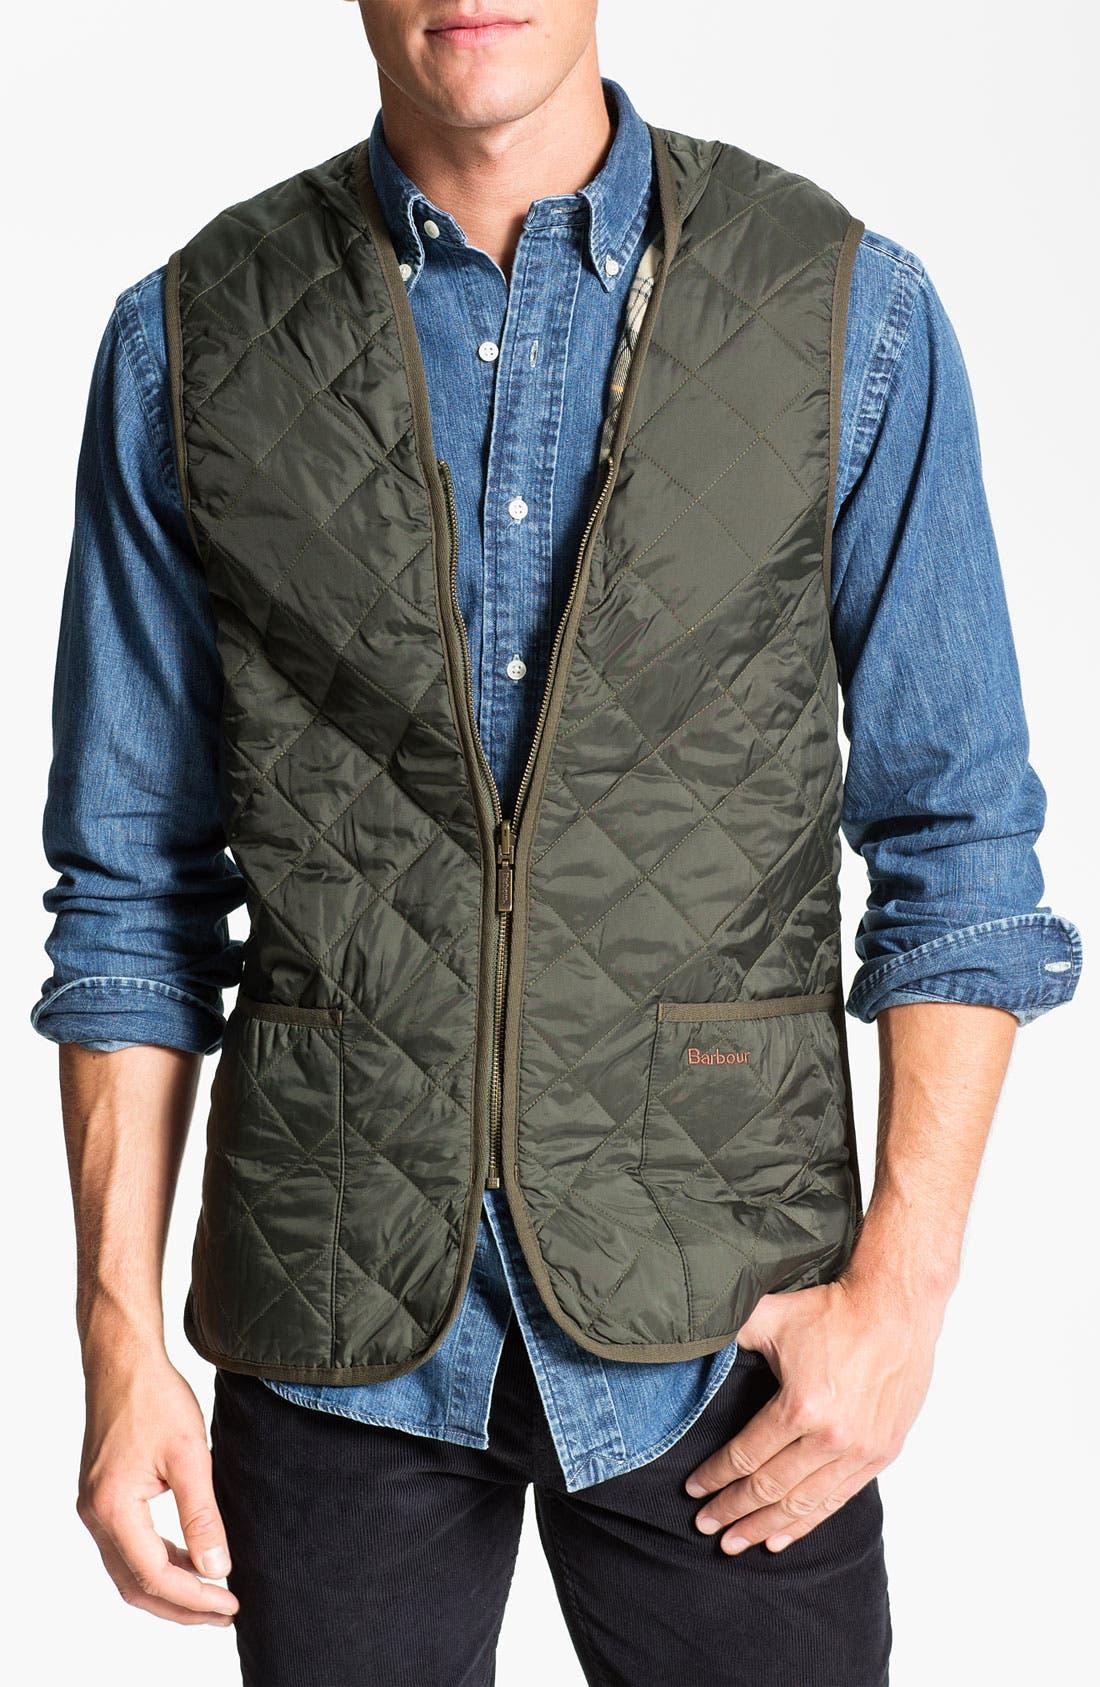 Alternate Image 1 Selected - Barbour Quilted Zip-In Liner Vest